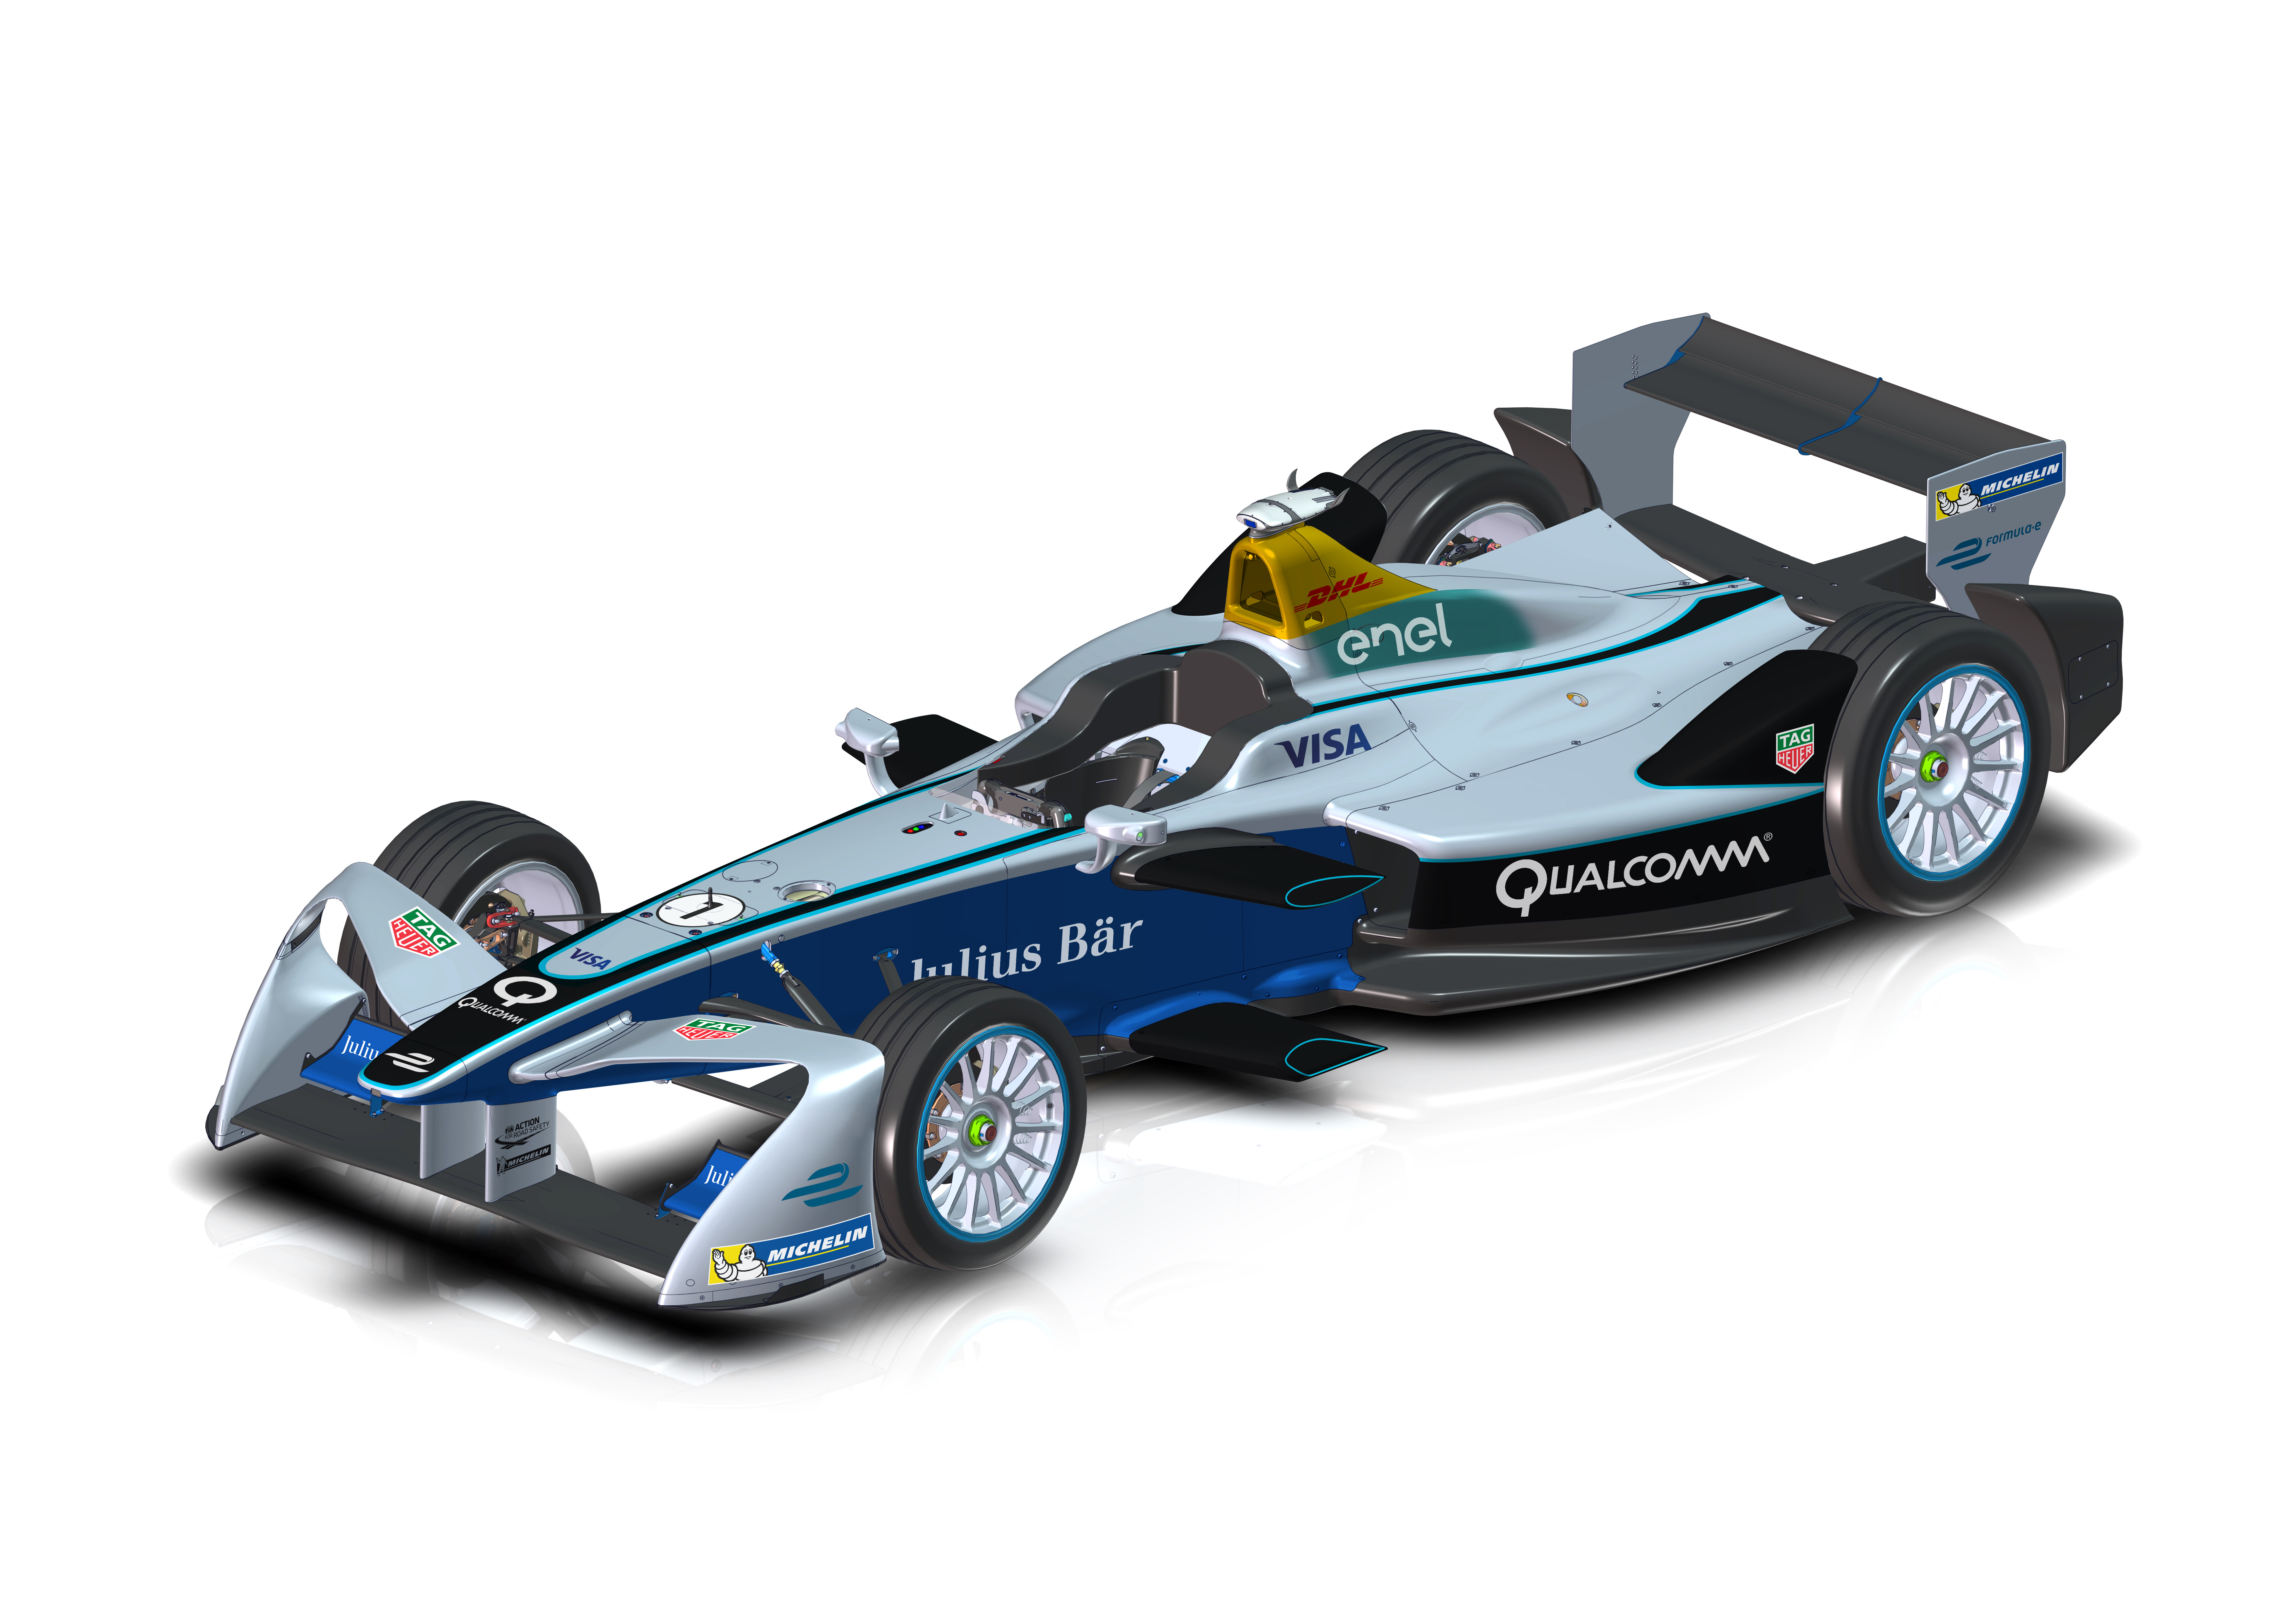 Fe bold new look for fia formula e car federation internationale de l automobile